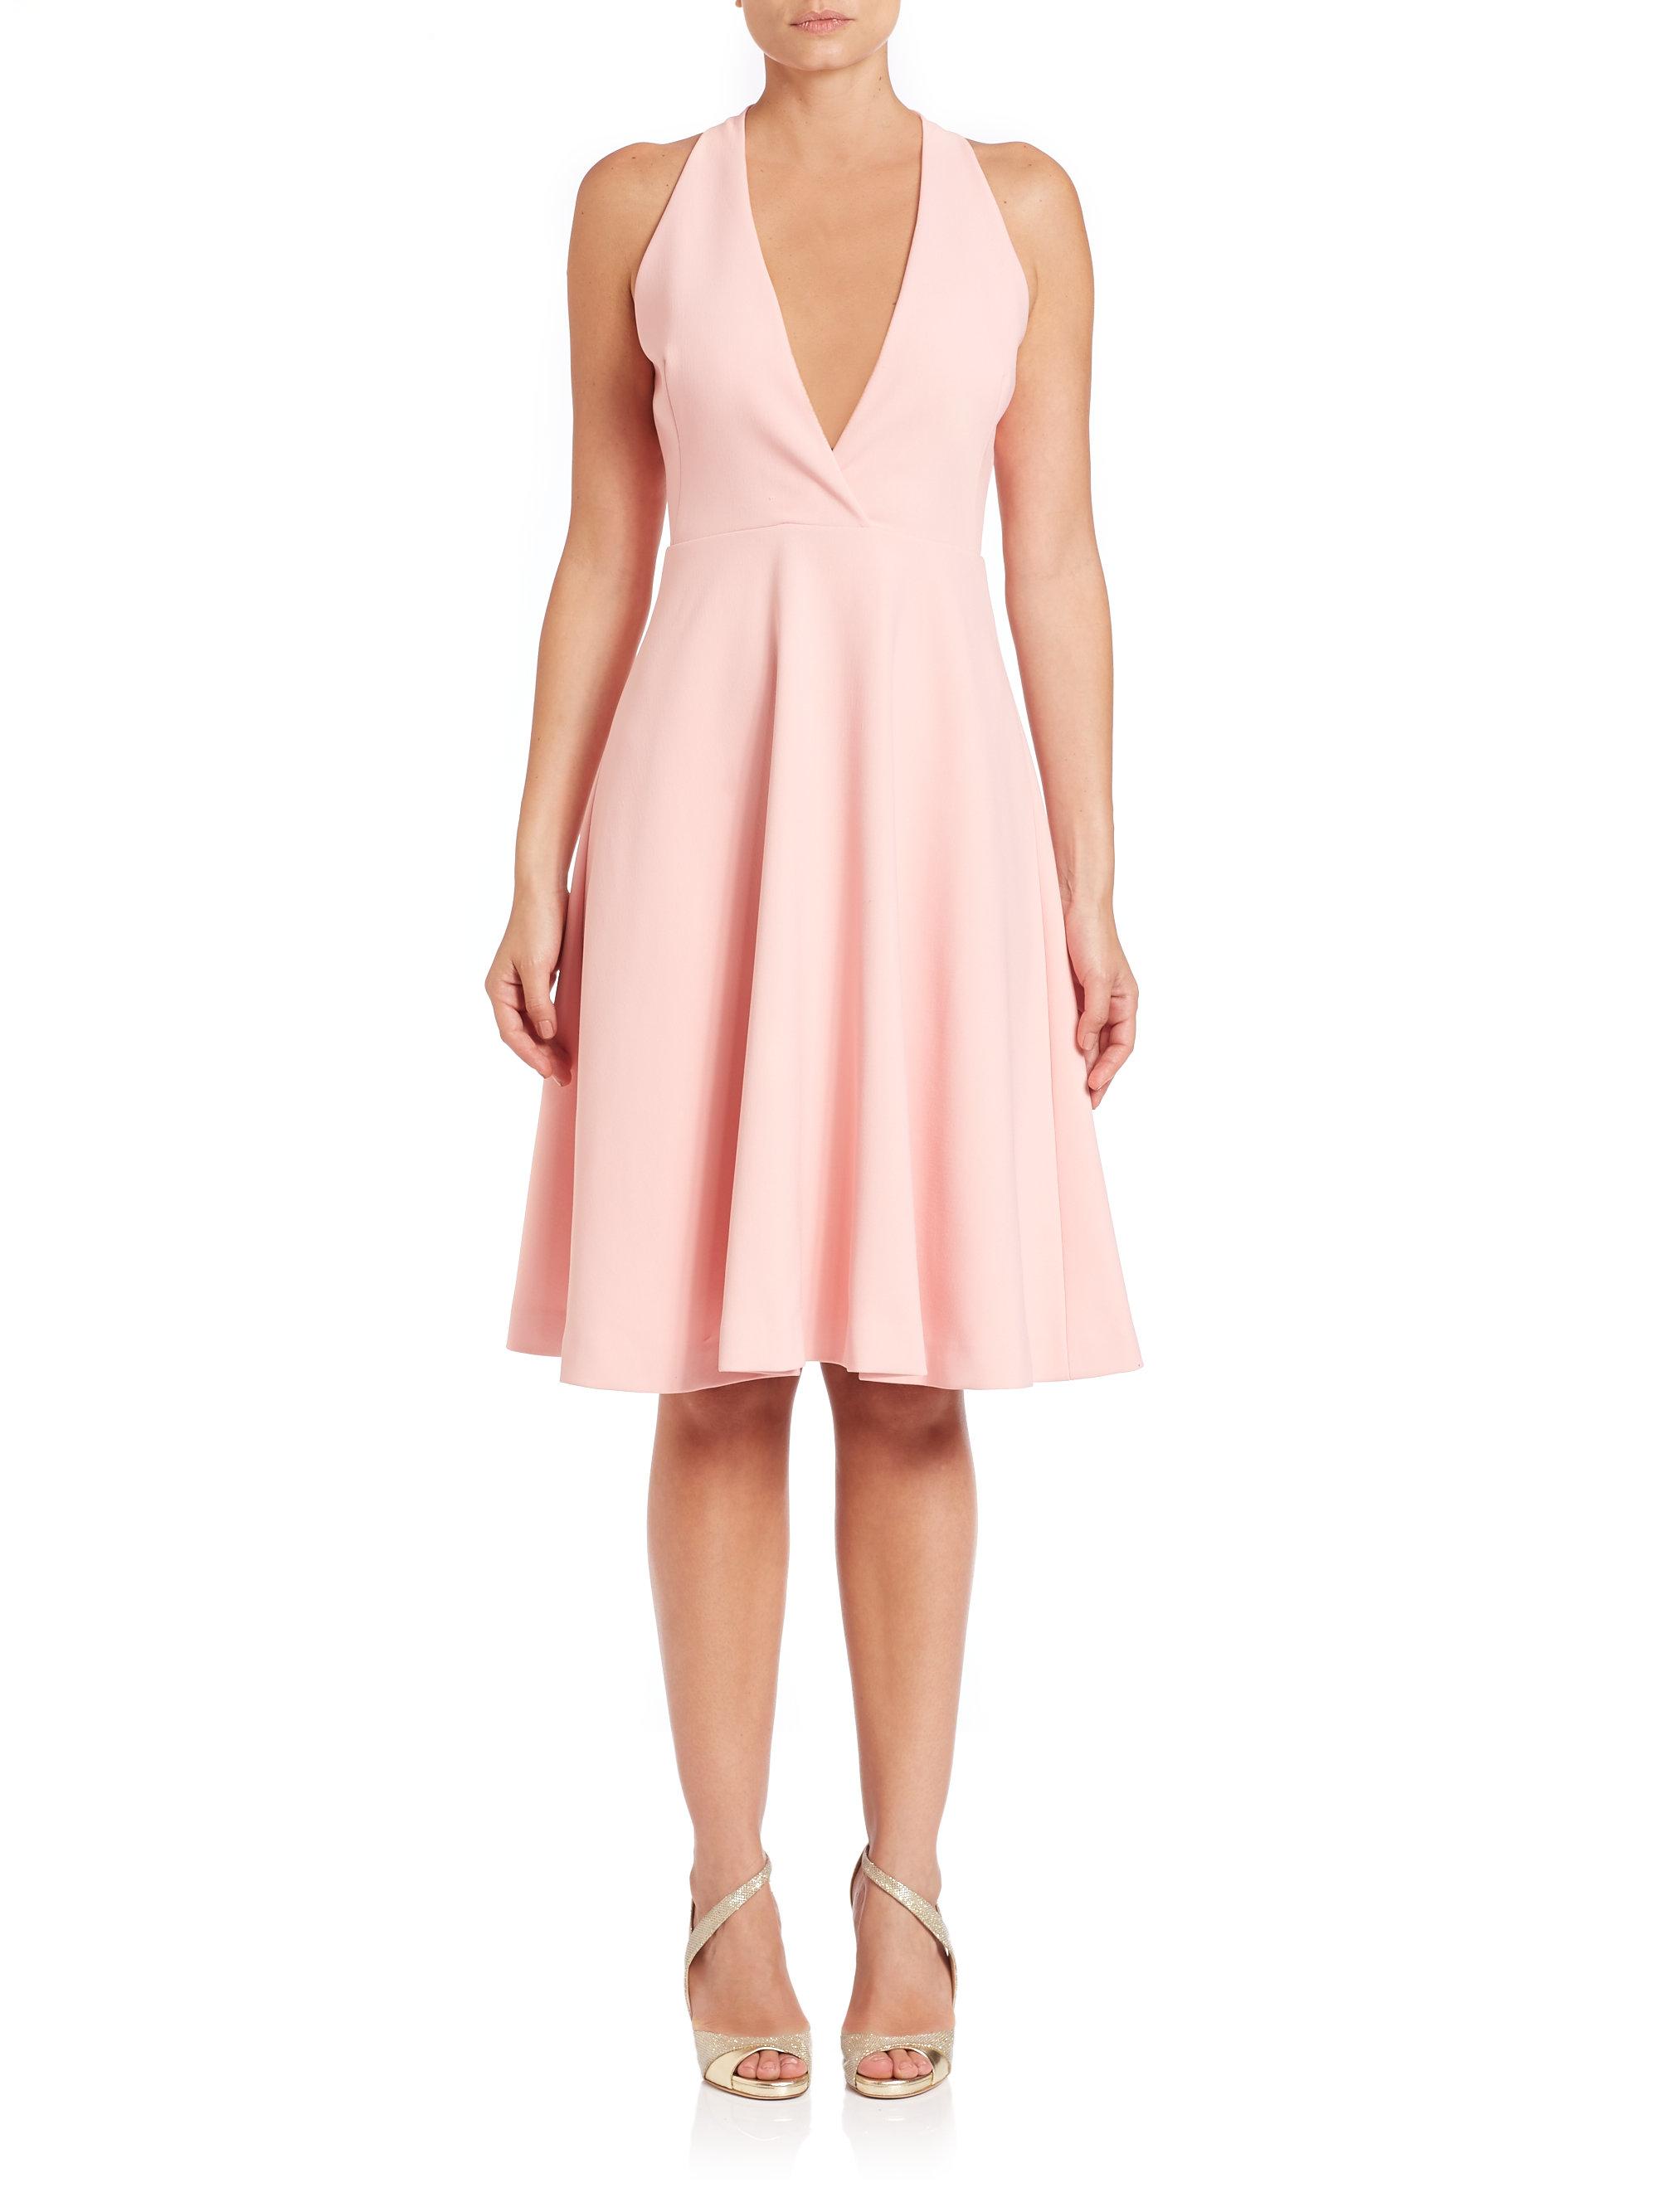 Topshop Deep V Neck Backless Zipper Hollow Out Plain Bodycon Dresses look wholesale bandage